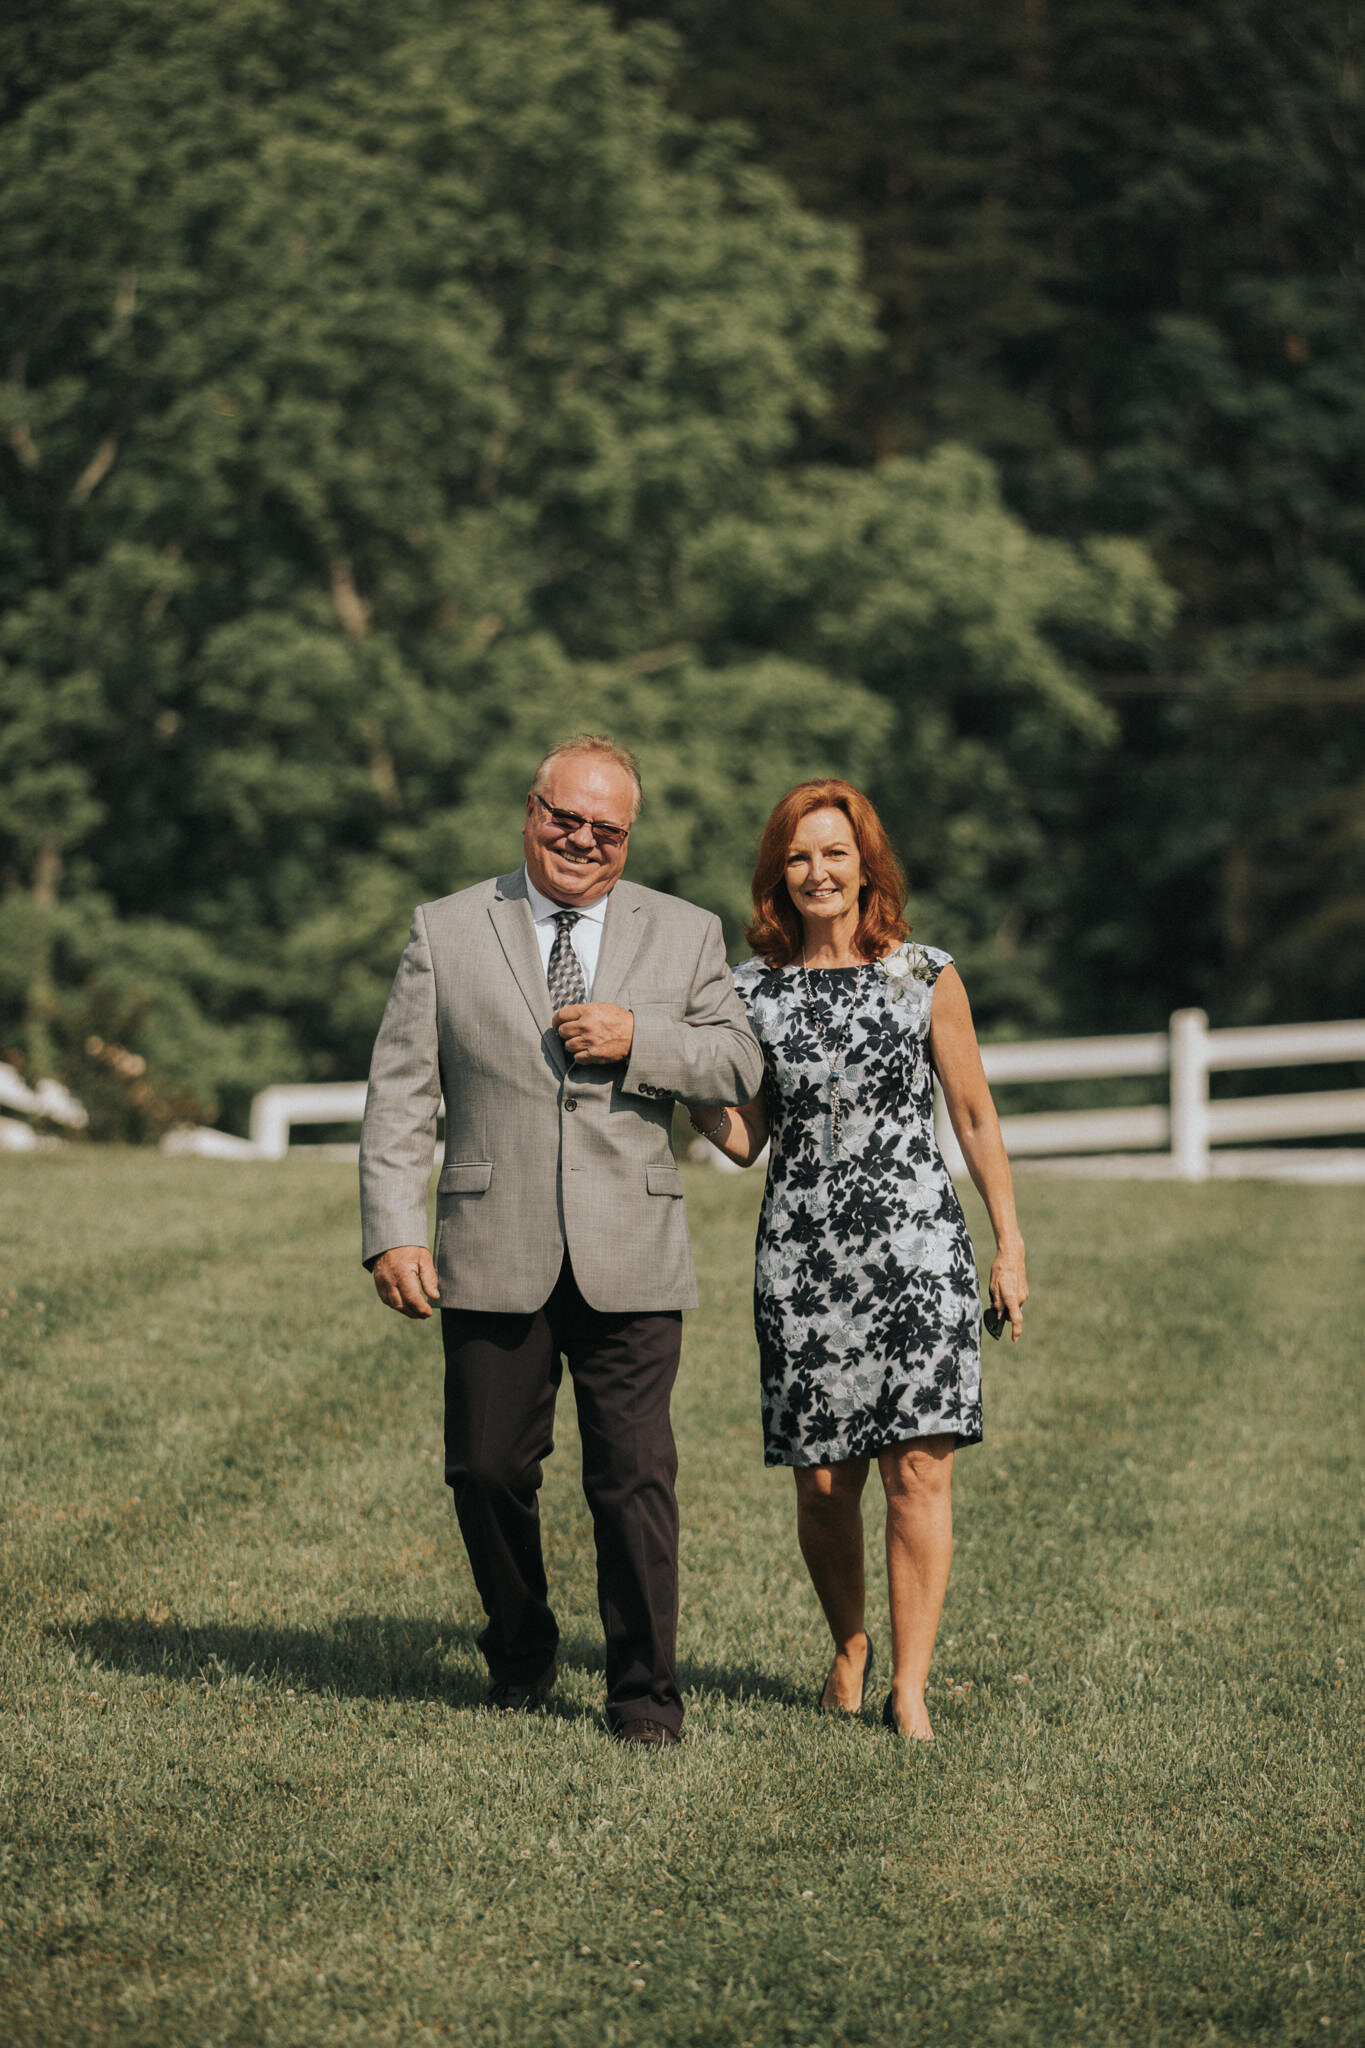 KateMatt-North-Georgia-Wedding-Photographer-Mountain-Laurel-Farm-90.jpg